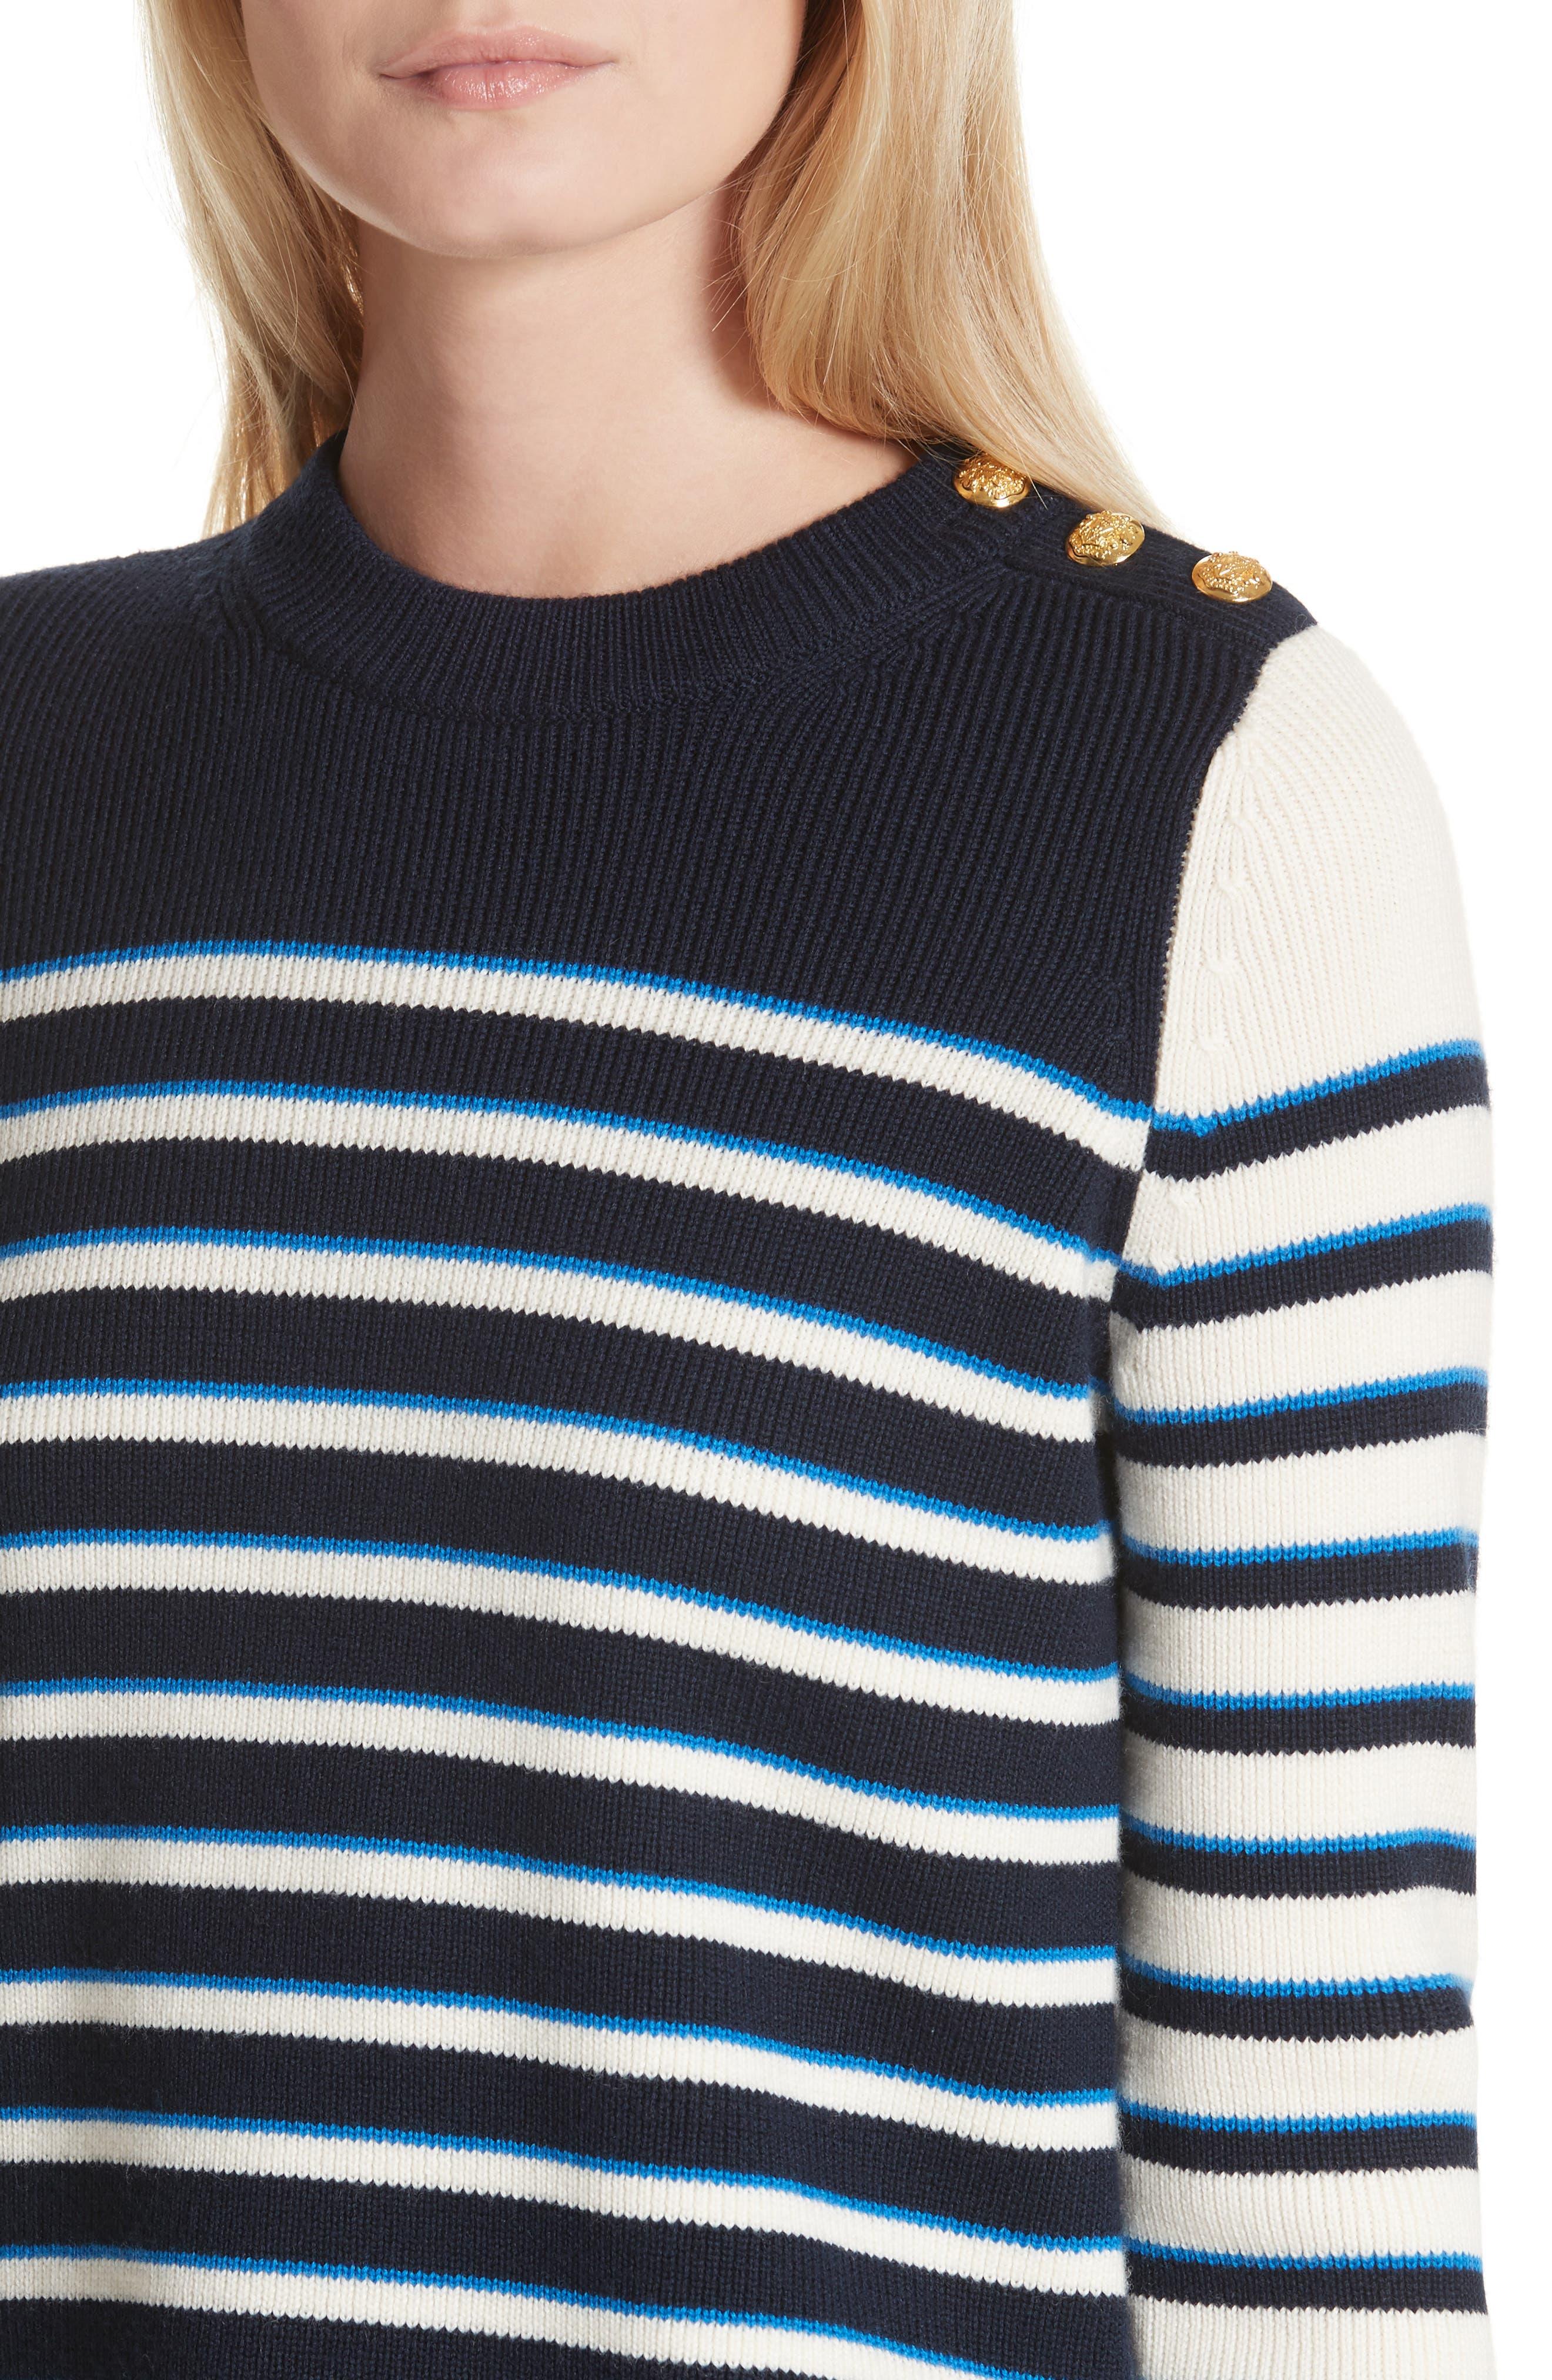 Amos Stripe Merino Wool Sweater,                             Alternate thumbnail 4, color,                             Navy/ Ivory/ Blue